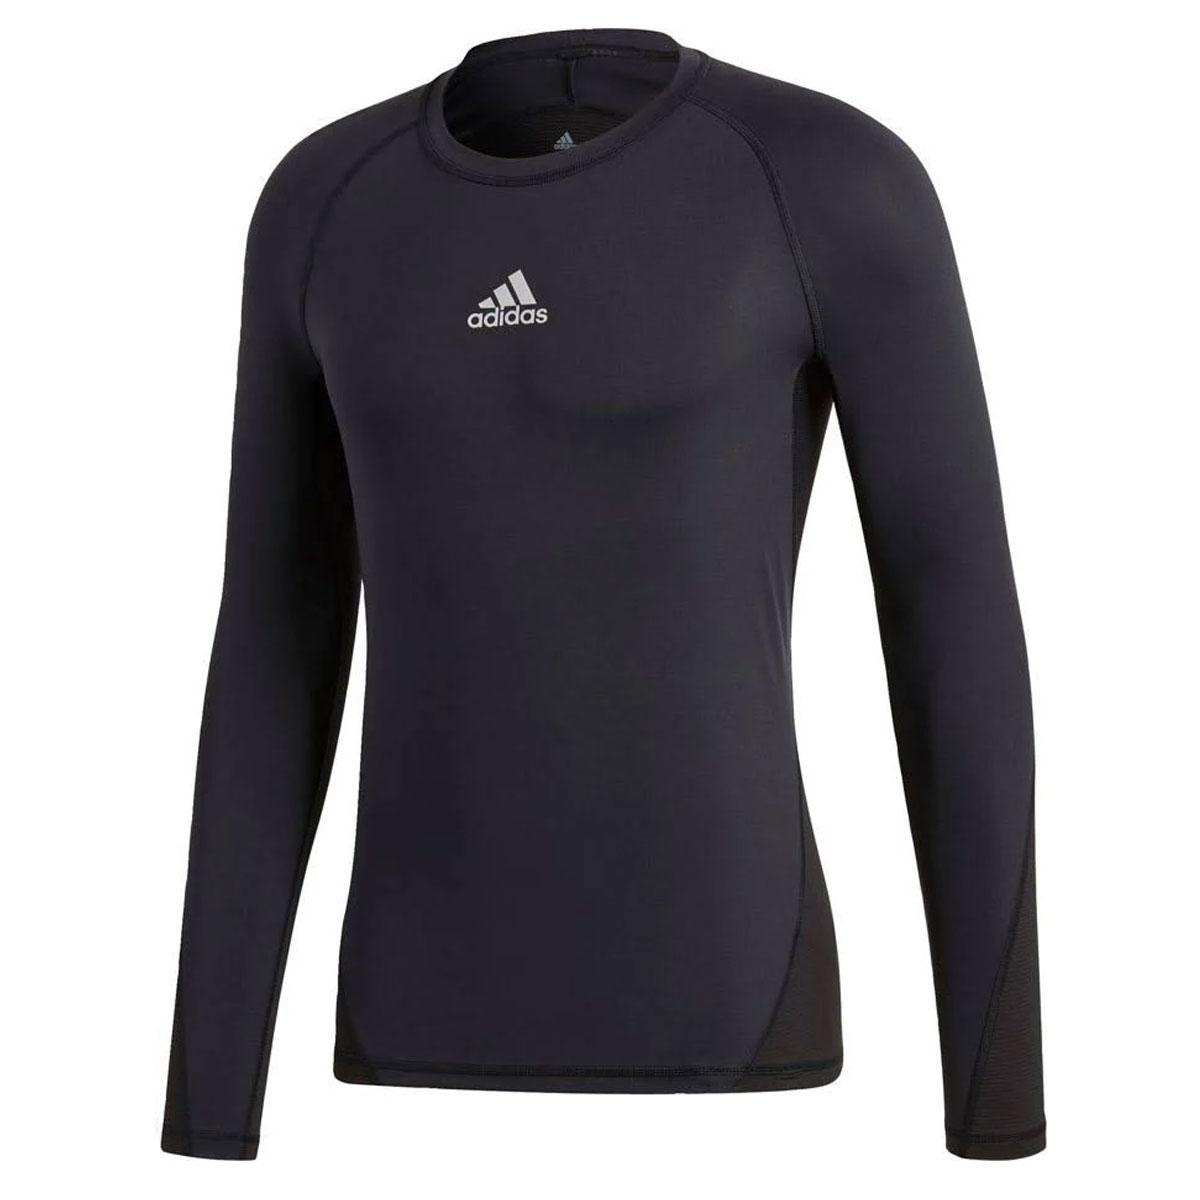 top kwaliteit later te koop Adidas Alphaskin Shirt Lange Mouw